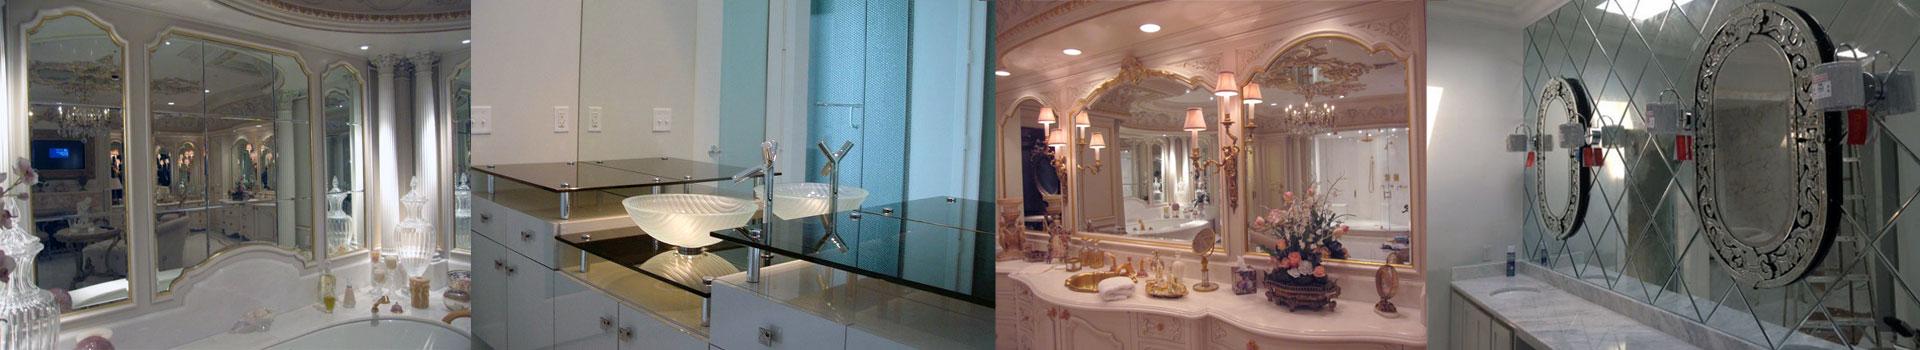 Custom Mirror Fabrication And Installation In Dallas Texas